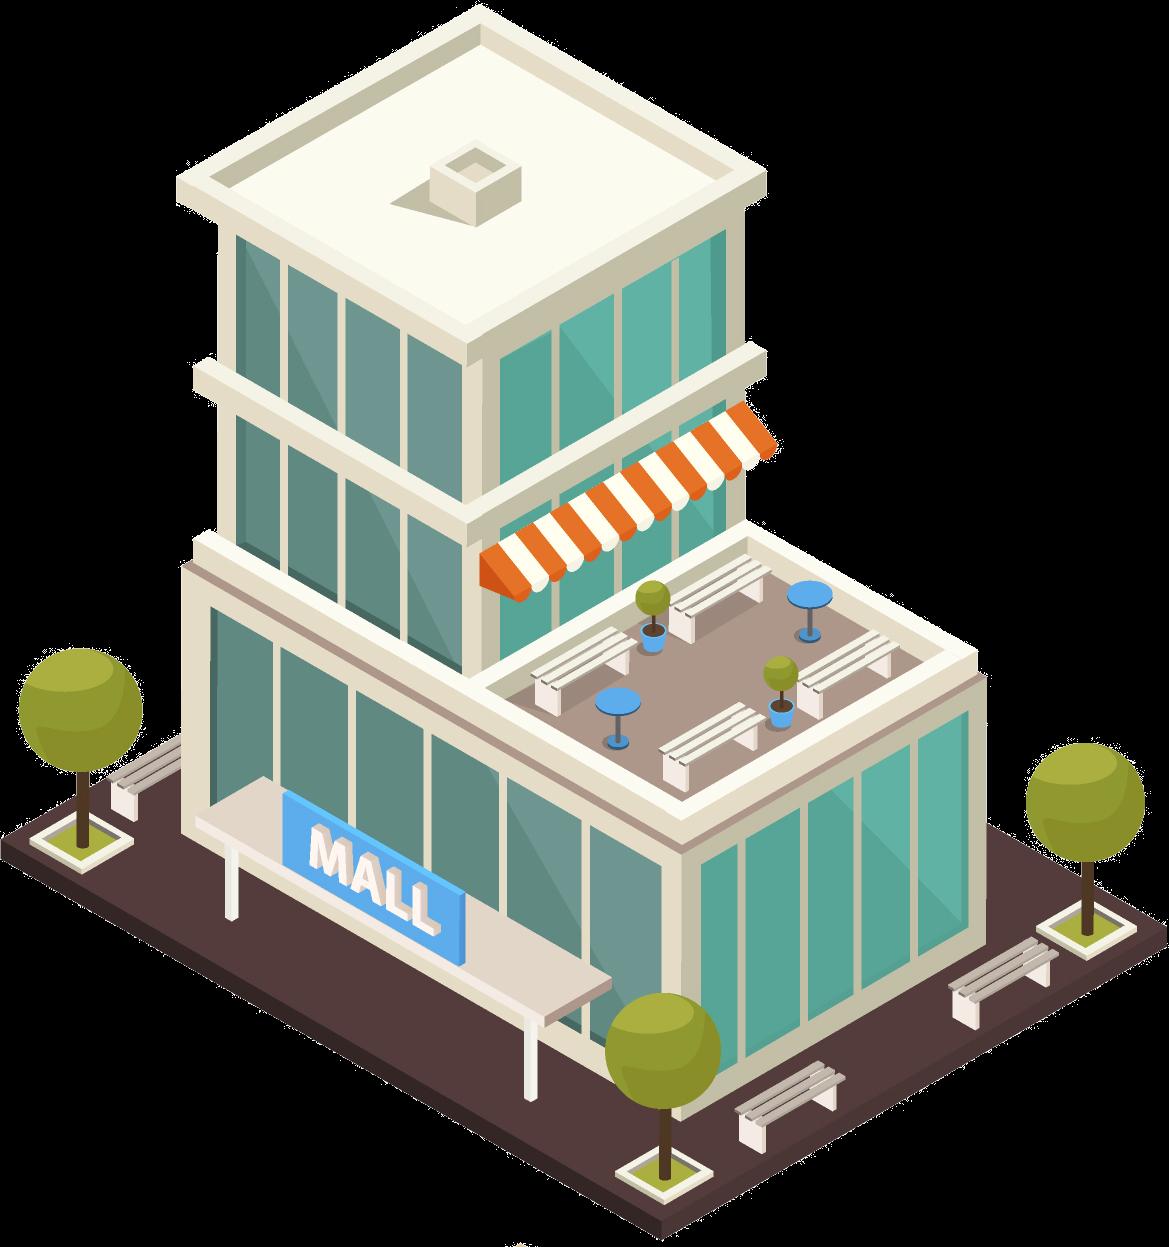 /industries/shopping-malls